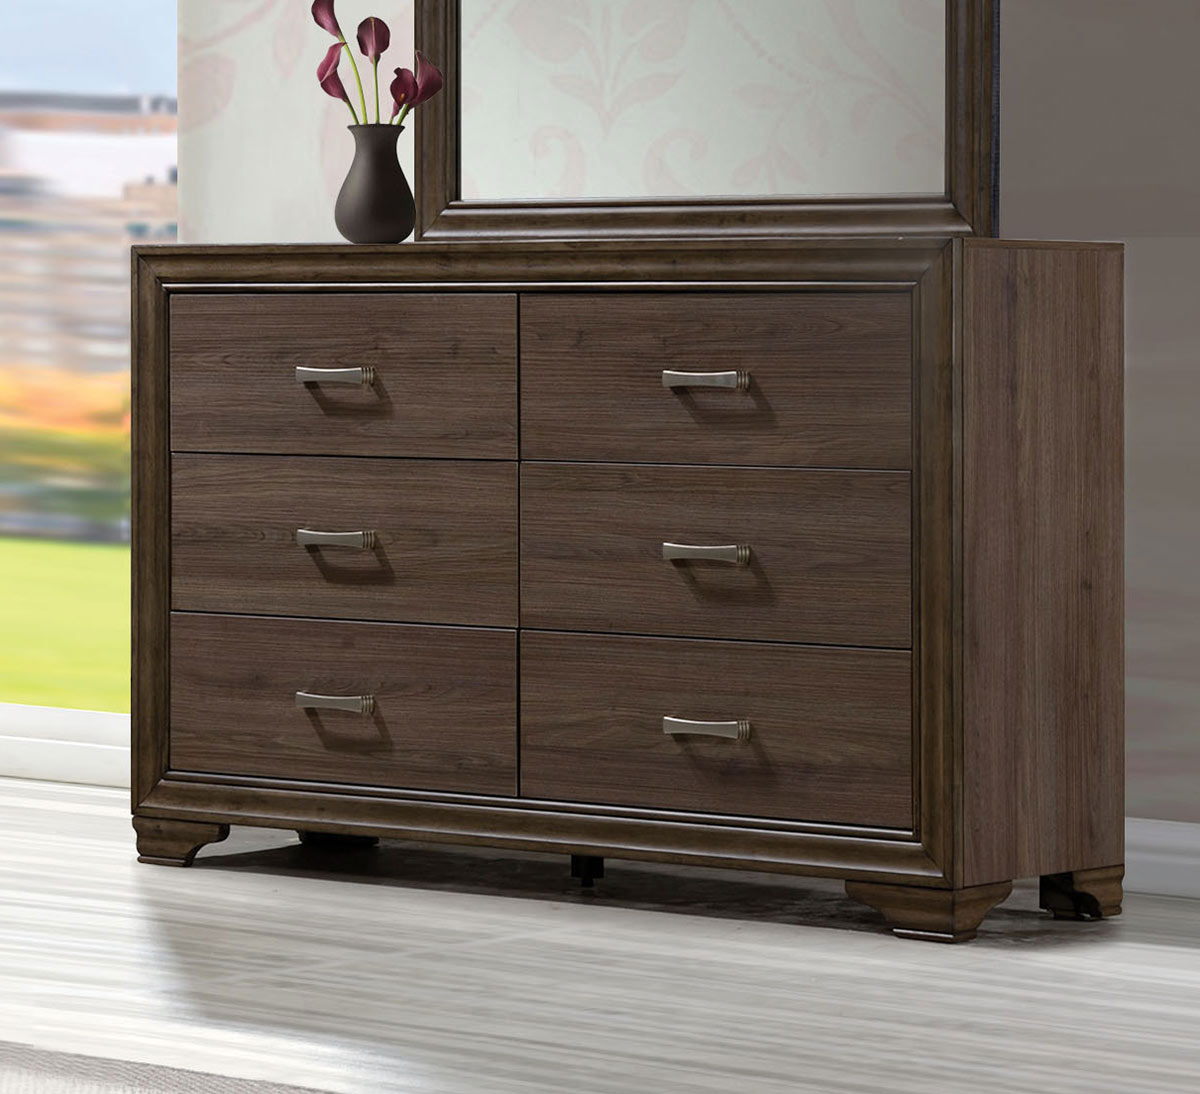 Acme Cyrille Dresser - Walnut